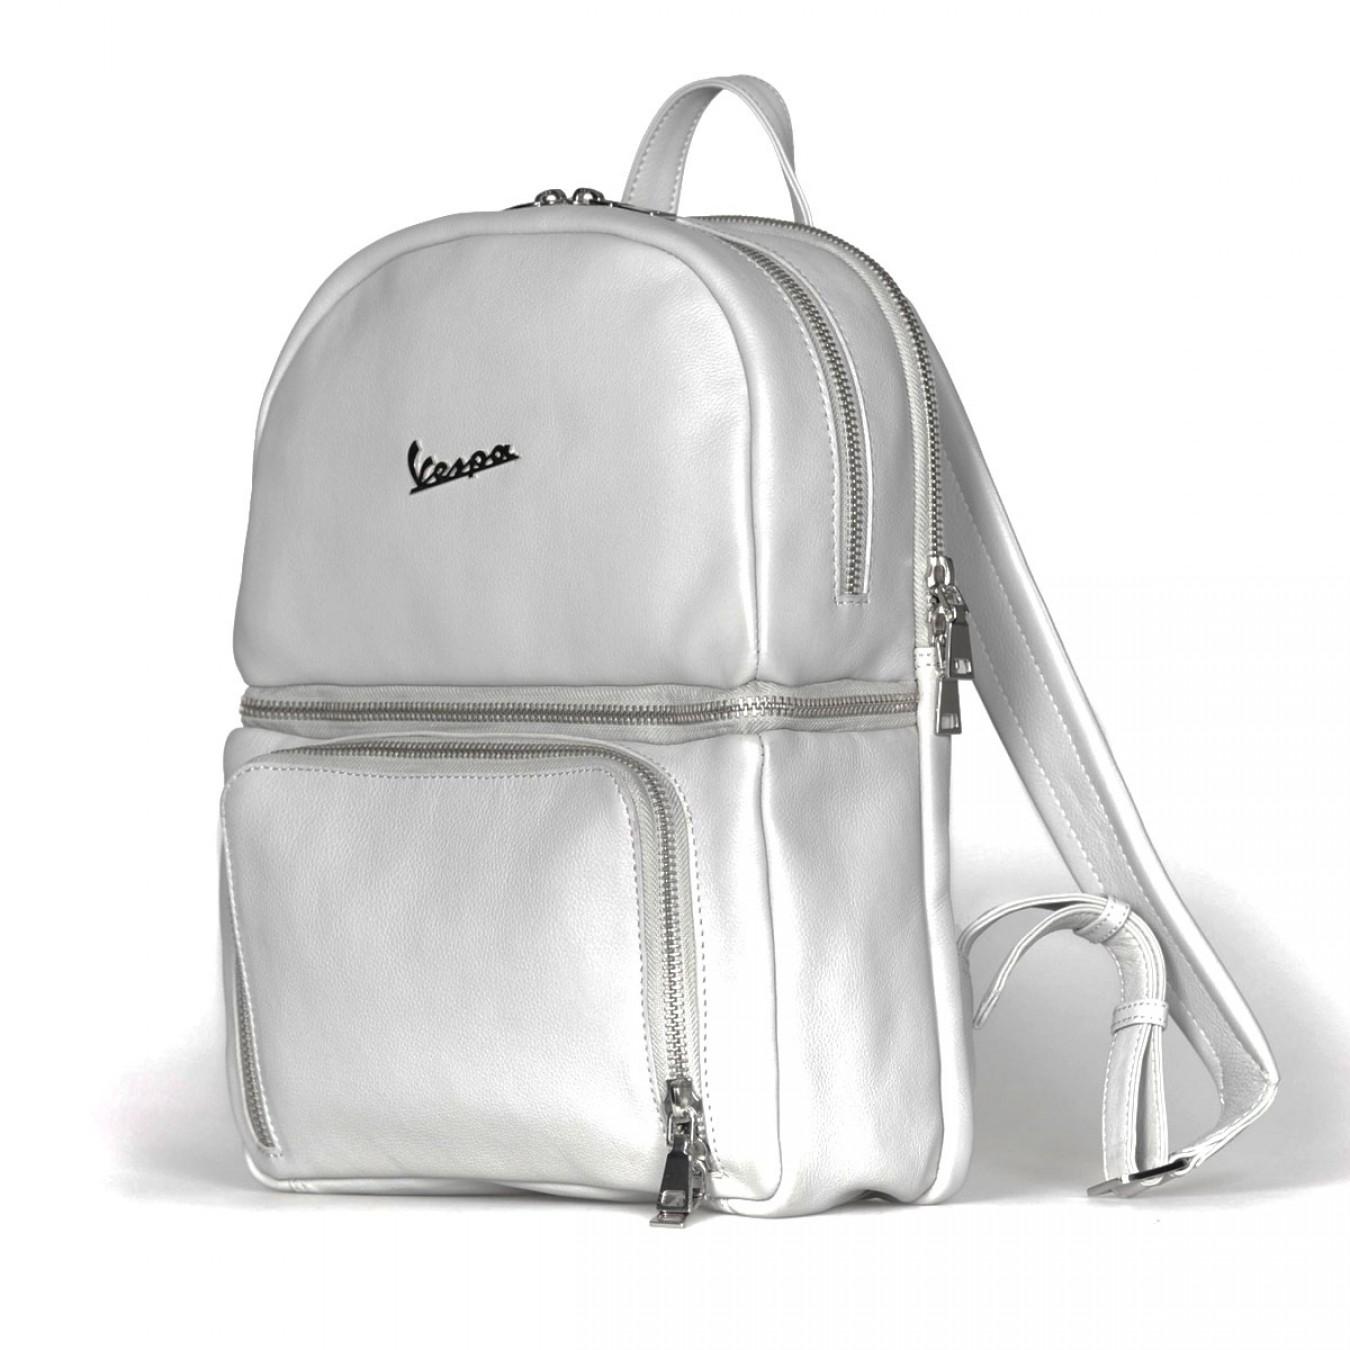 b0f0b386ab ... Vespa Σακίδιο Πλάτης Primavera 50TH Anniversary Backpack - Genuine Full  Grain Leather - Pearl Grey Τσάντες ...